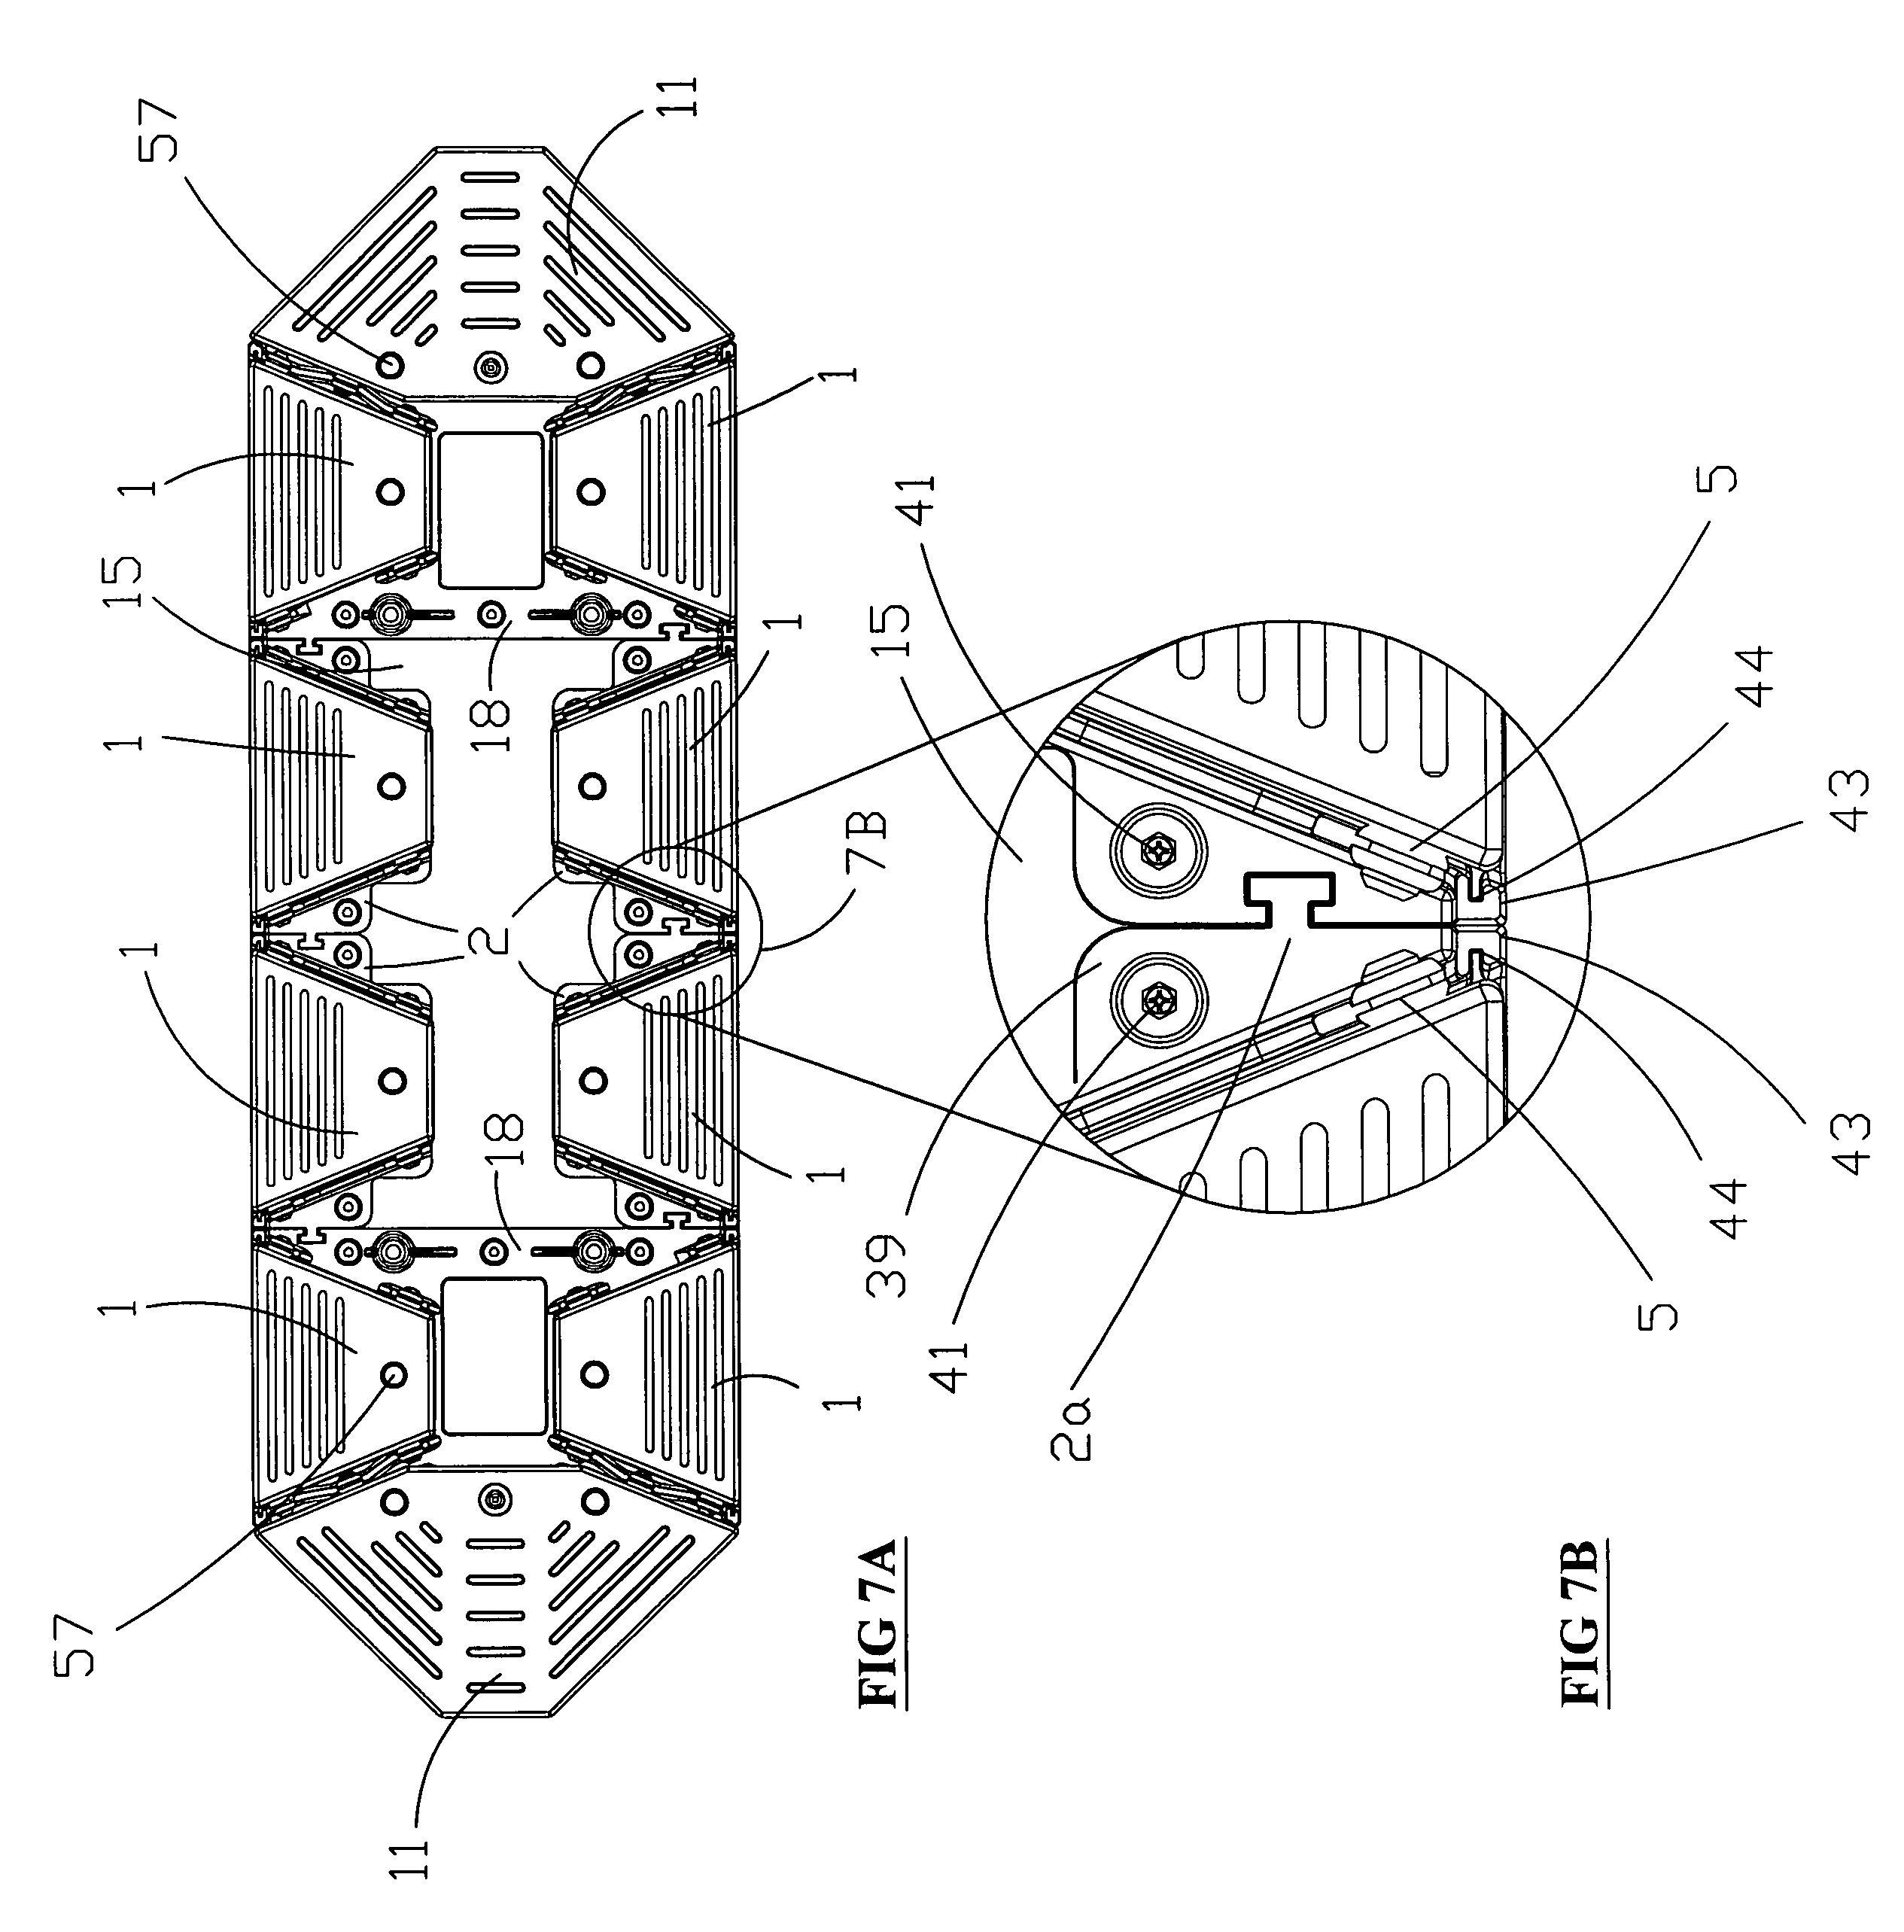 Patent Us8210725 - Light Bar